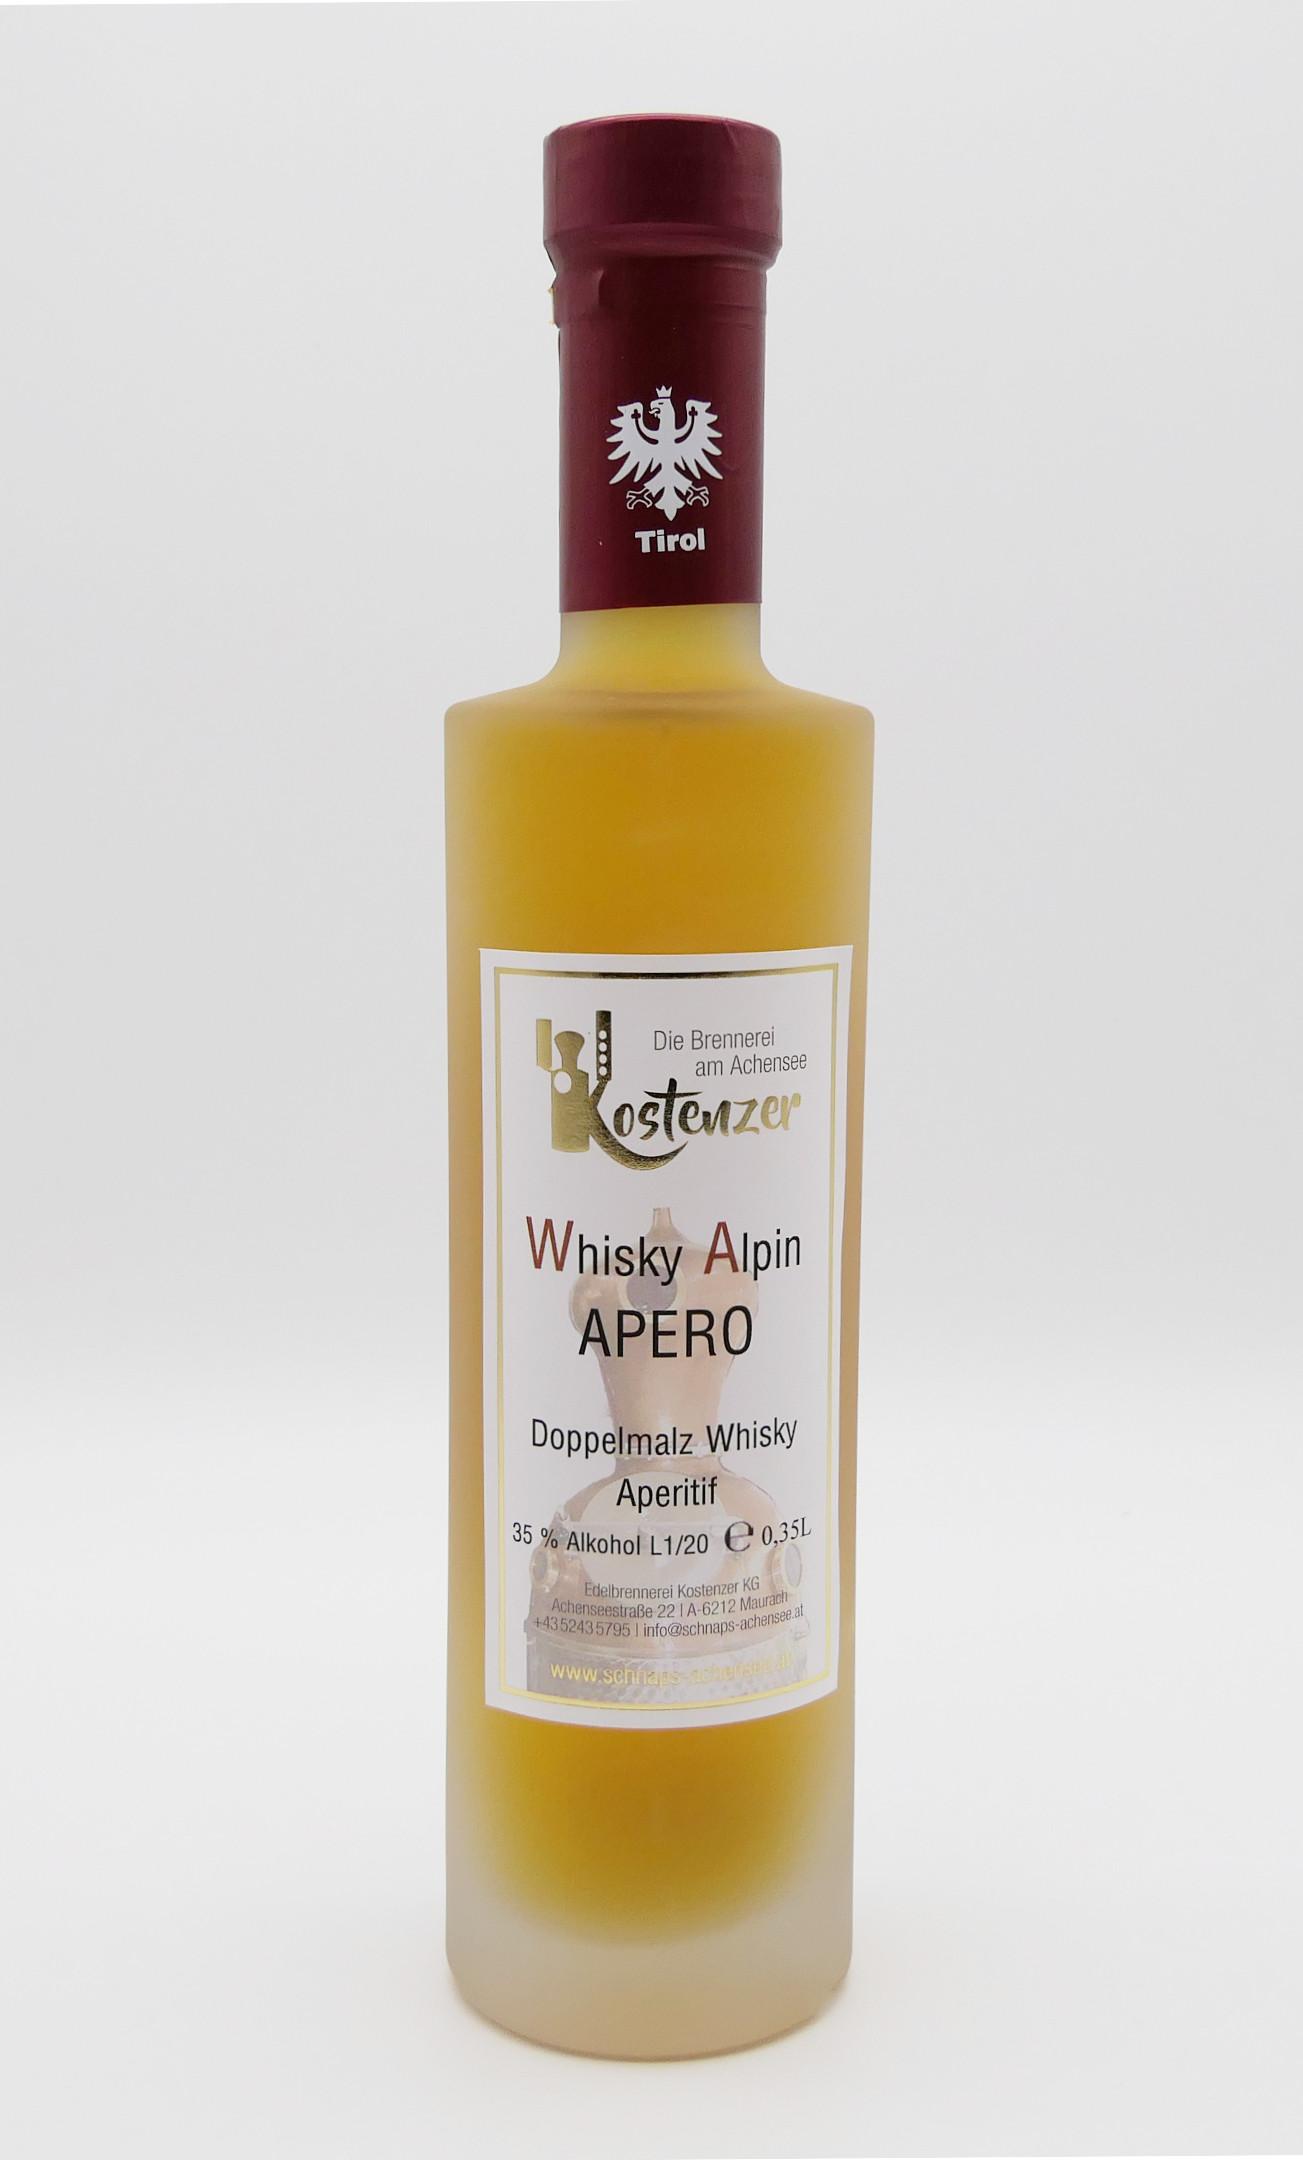 Whisky Alpin Apero